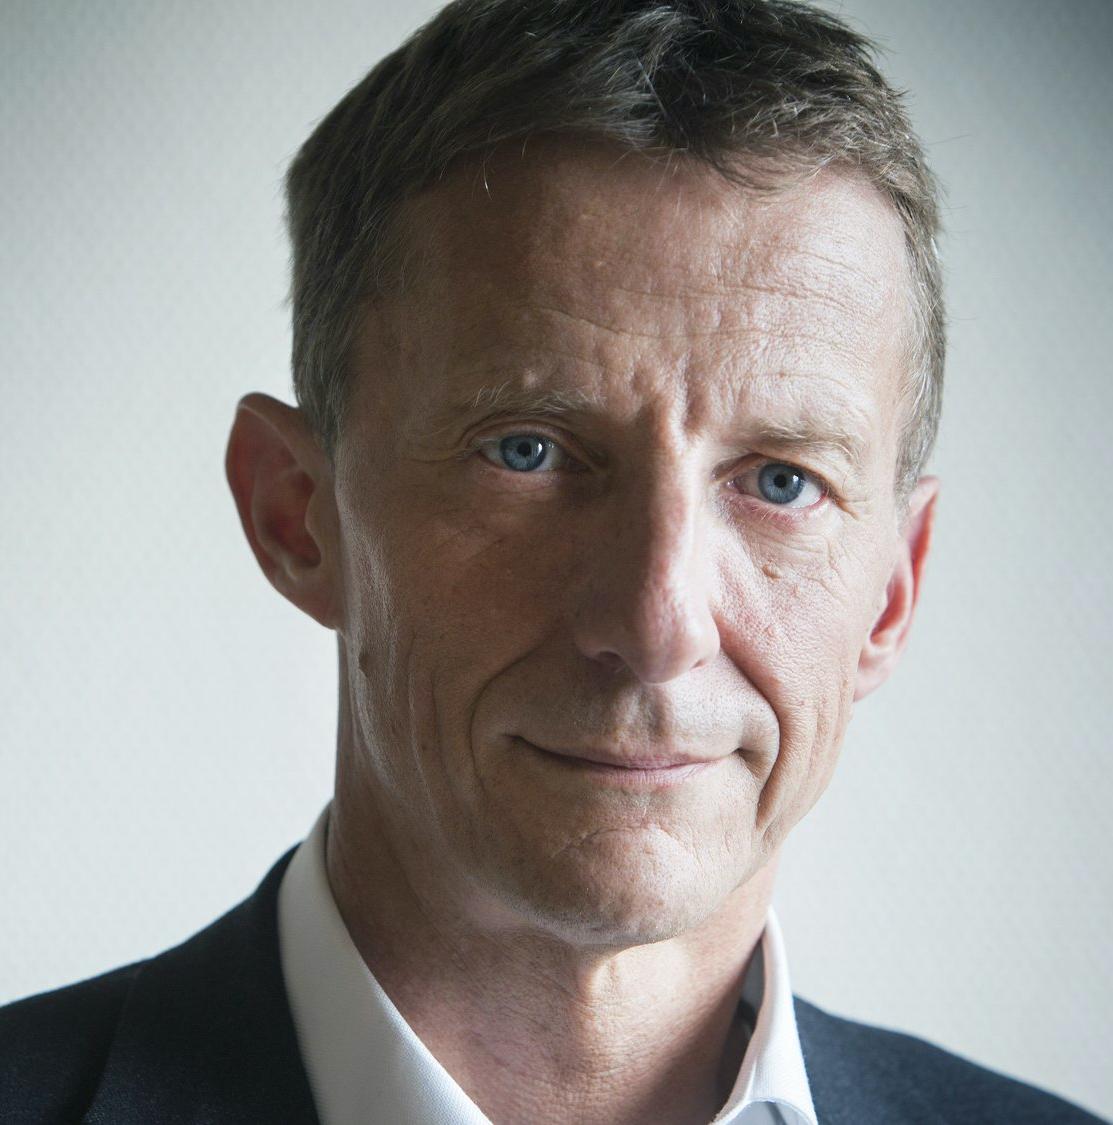 Guillaume Prache